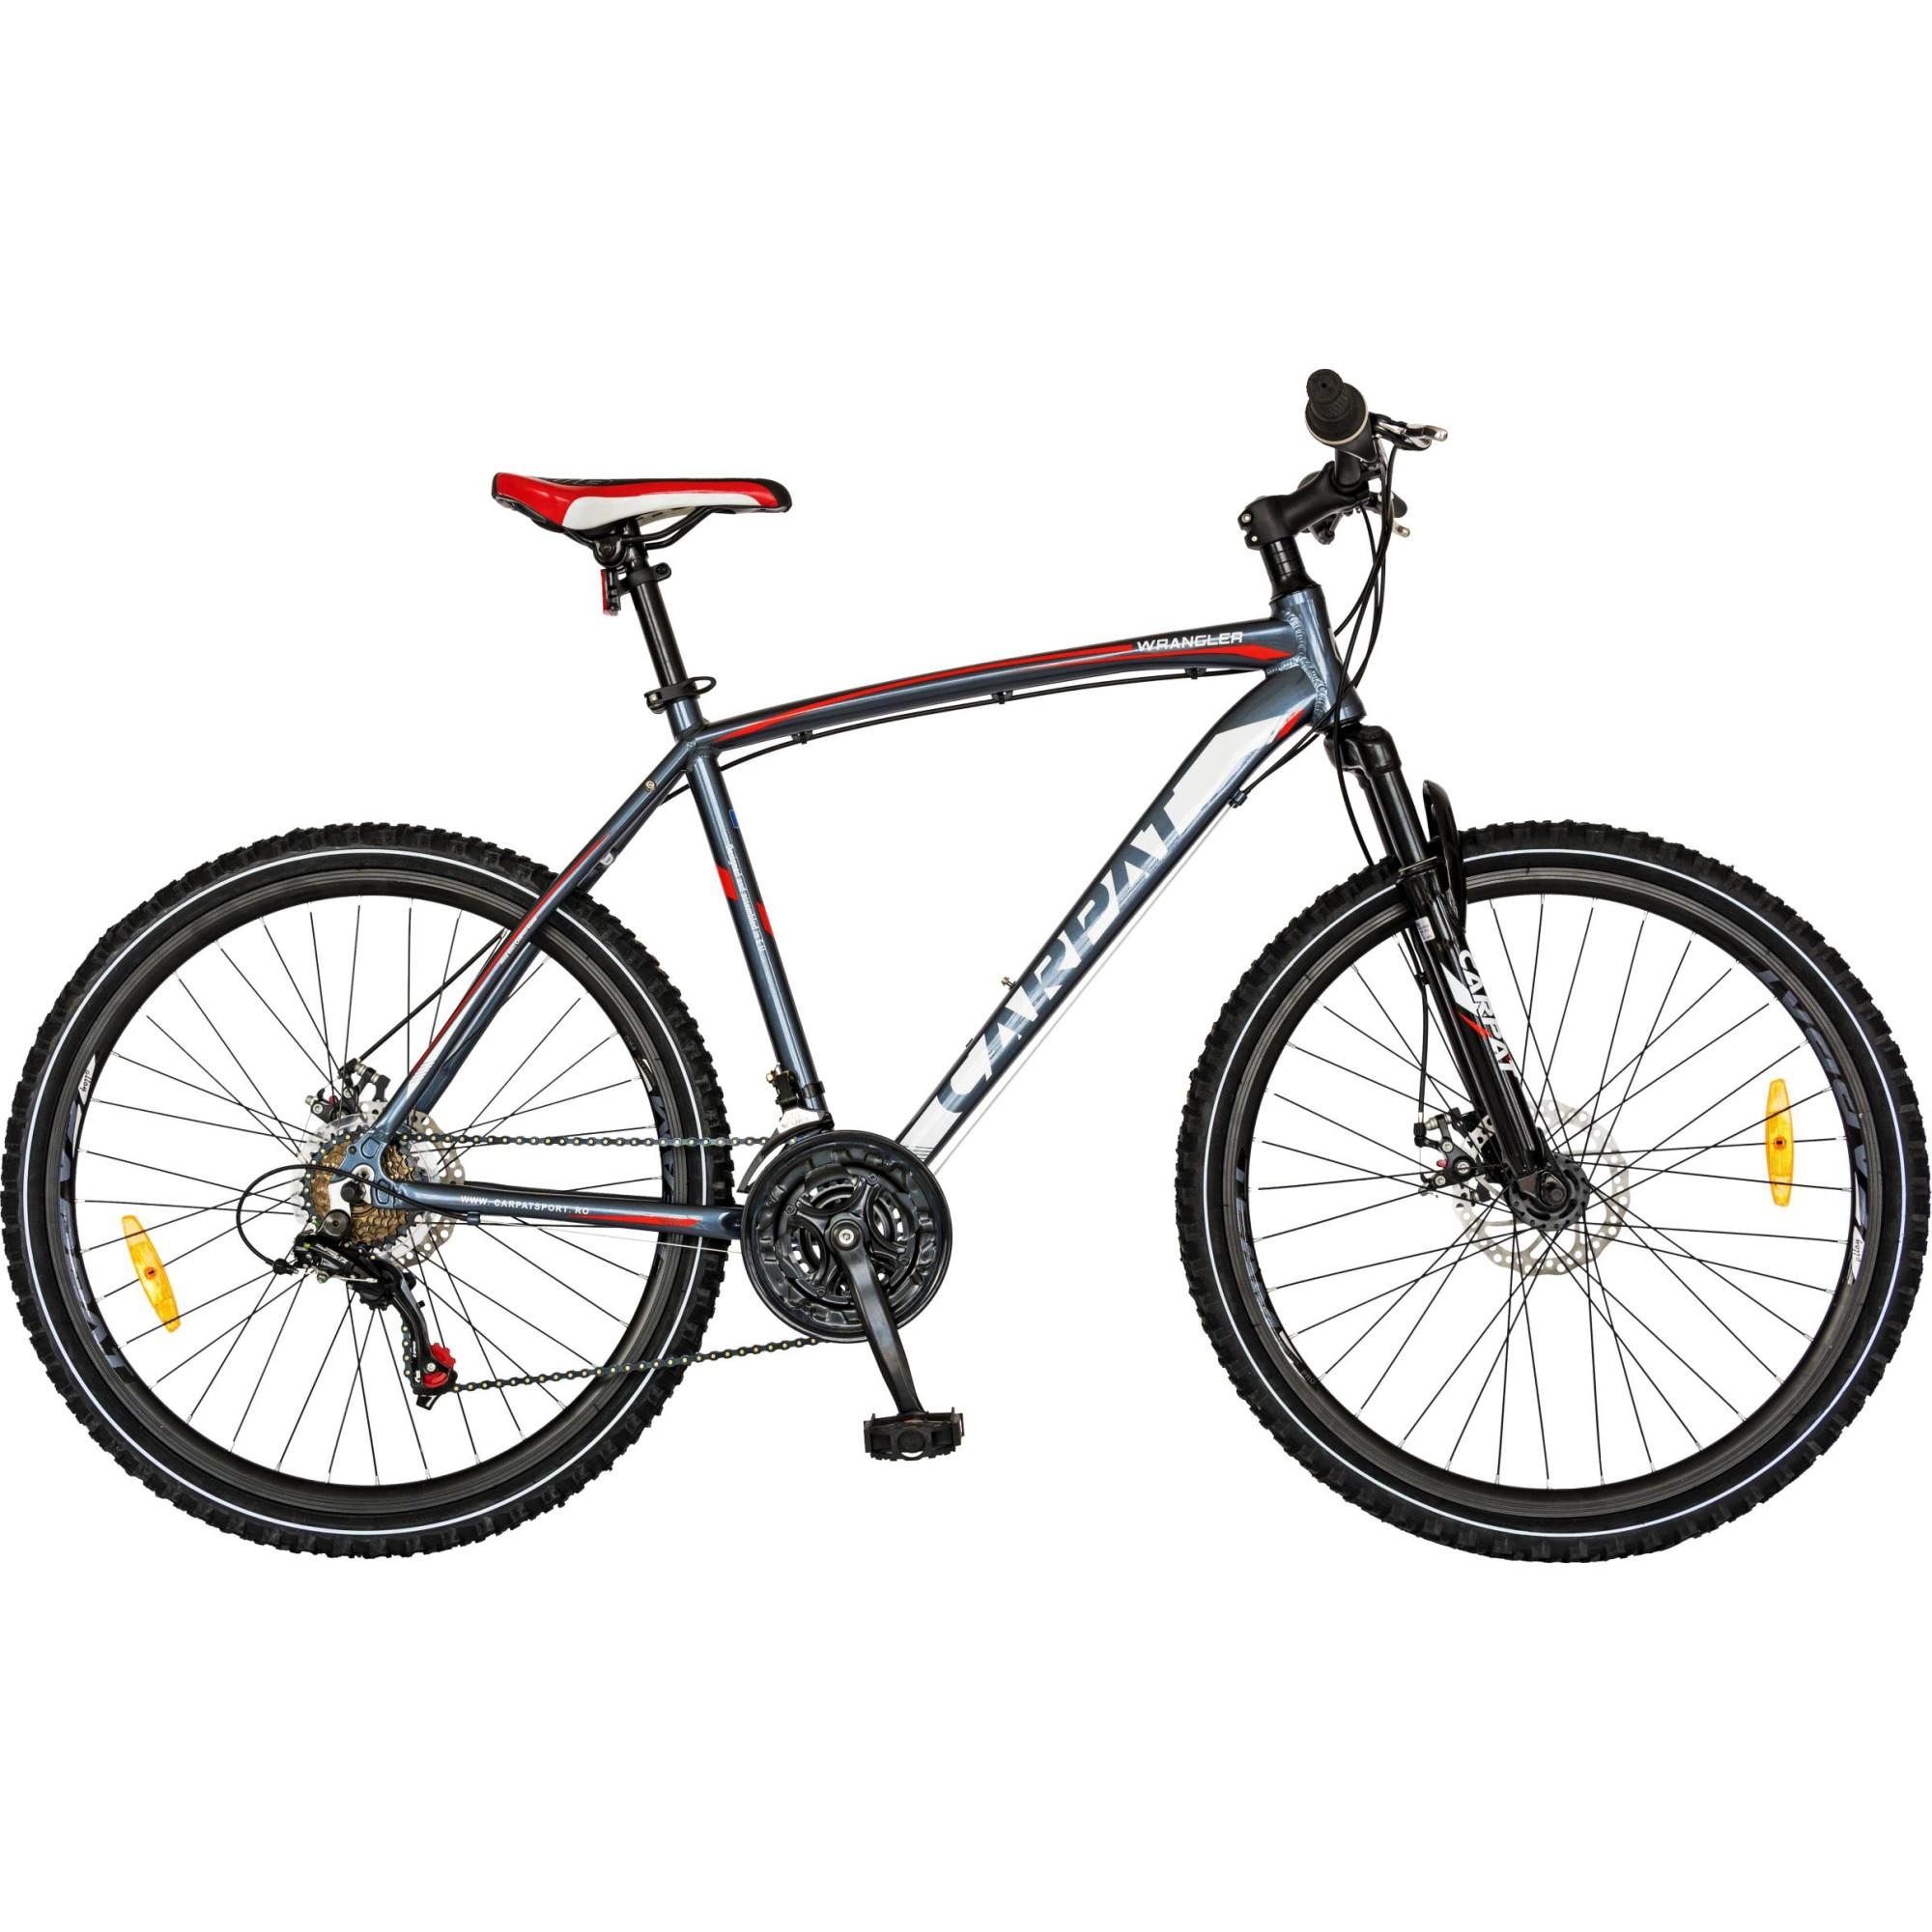 "Fotografie Bicicleta MTB 26"" Carpat Wrangler C2655B M, Negru/Rosu"